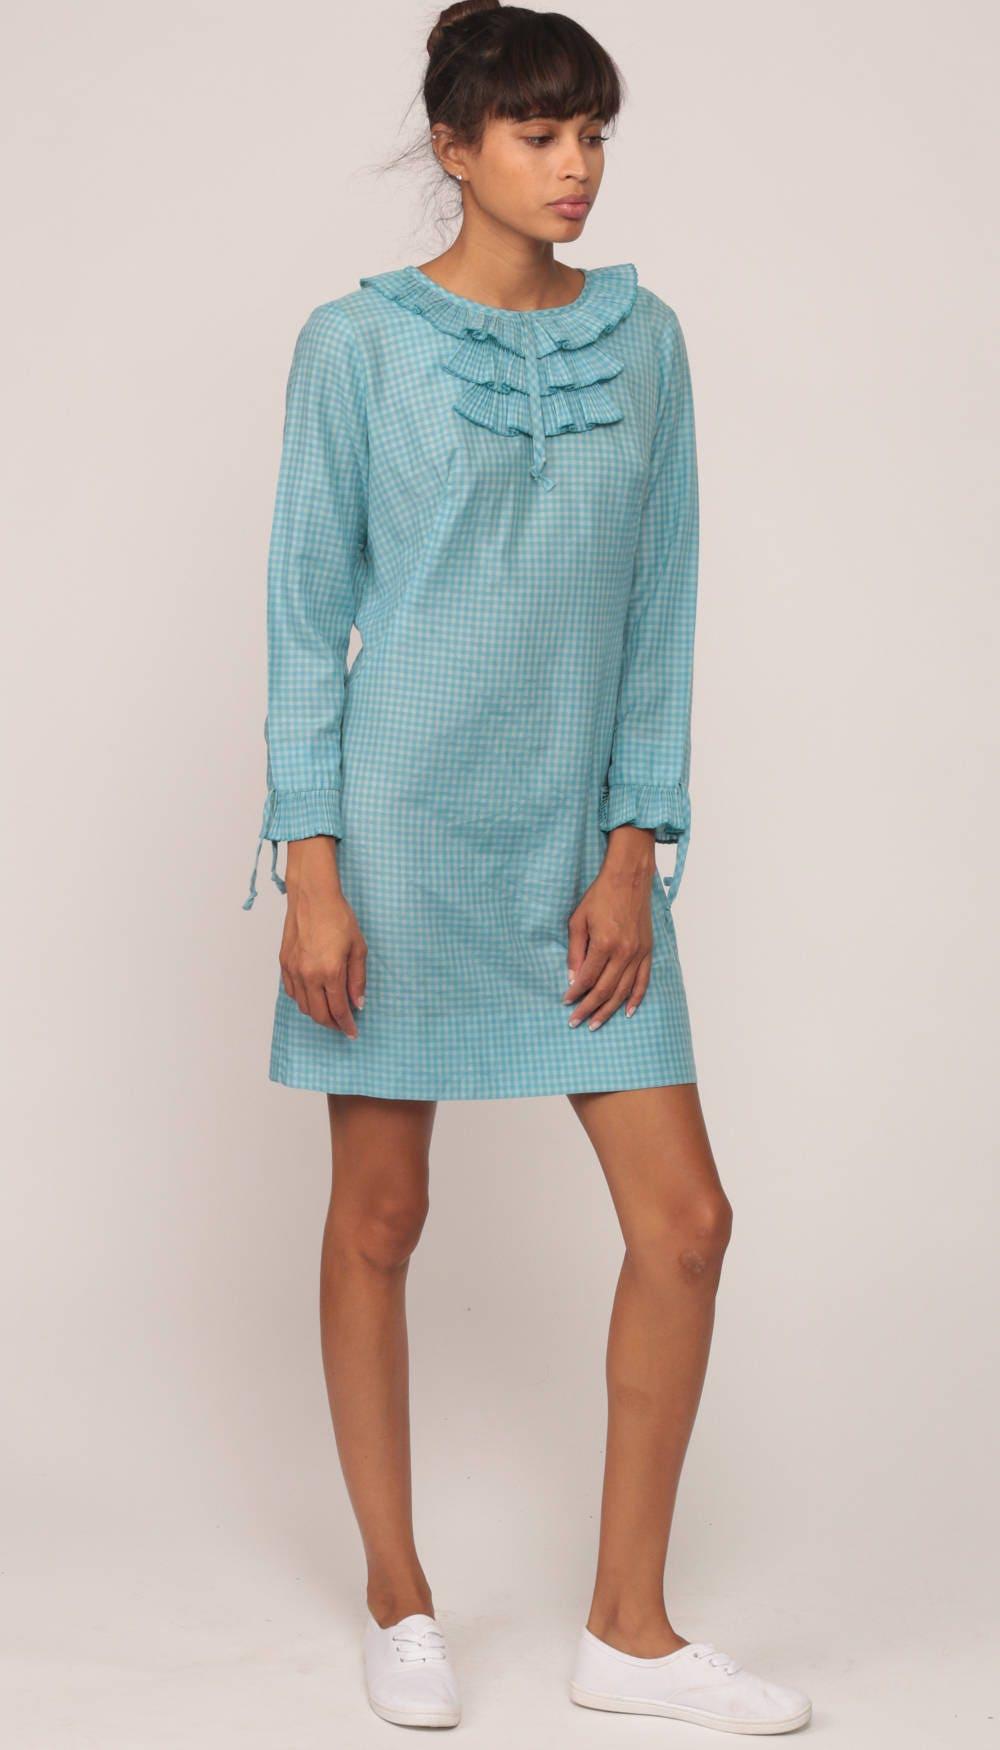 60s Mini Dress Mod Ruffle Twiggy Blue GINGHAM Print 1960s xs